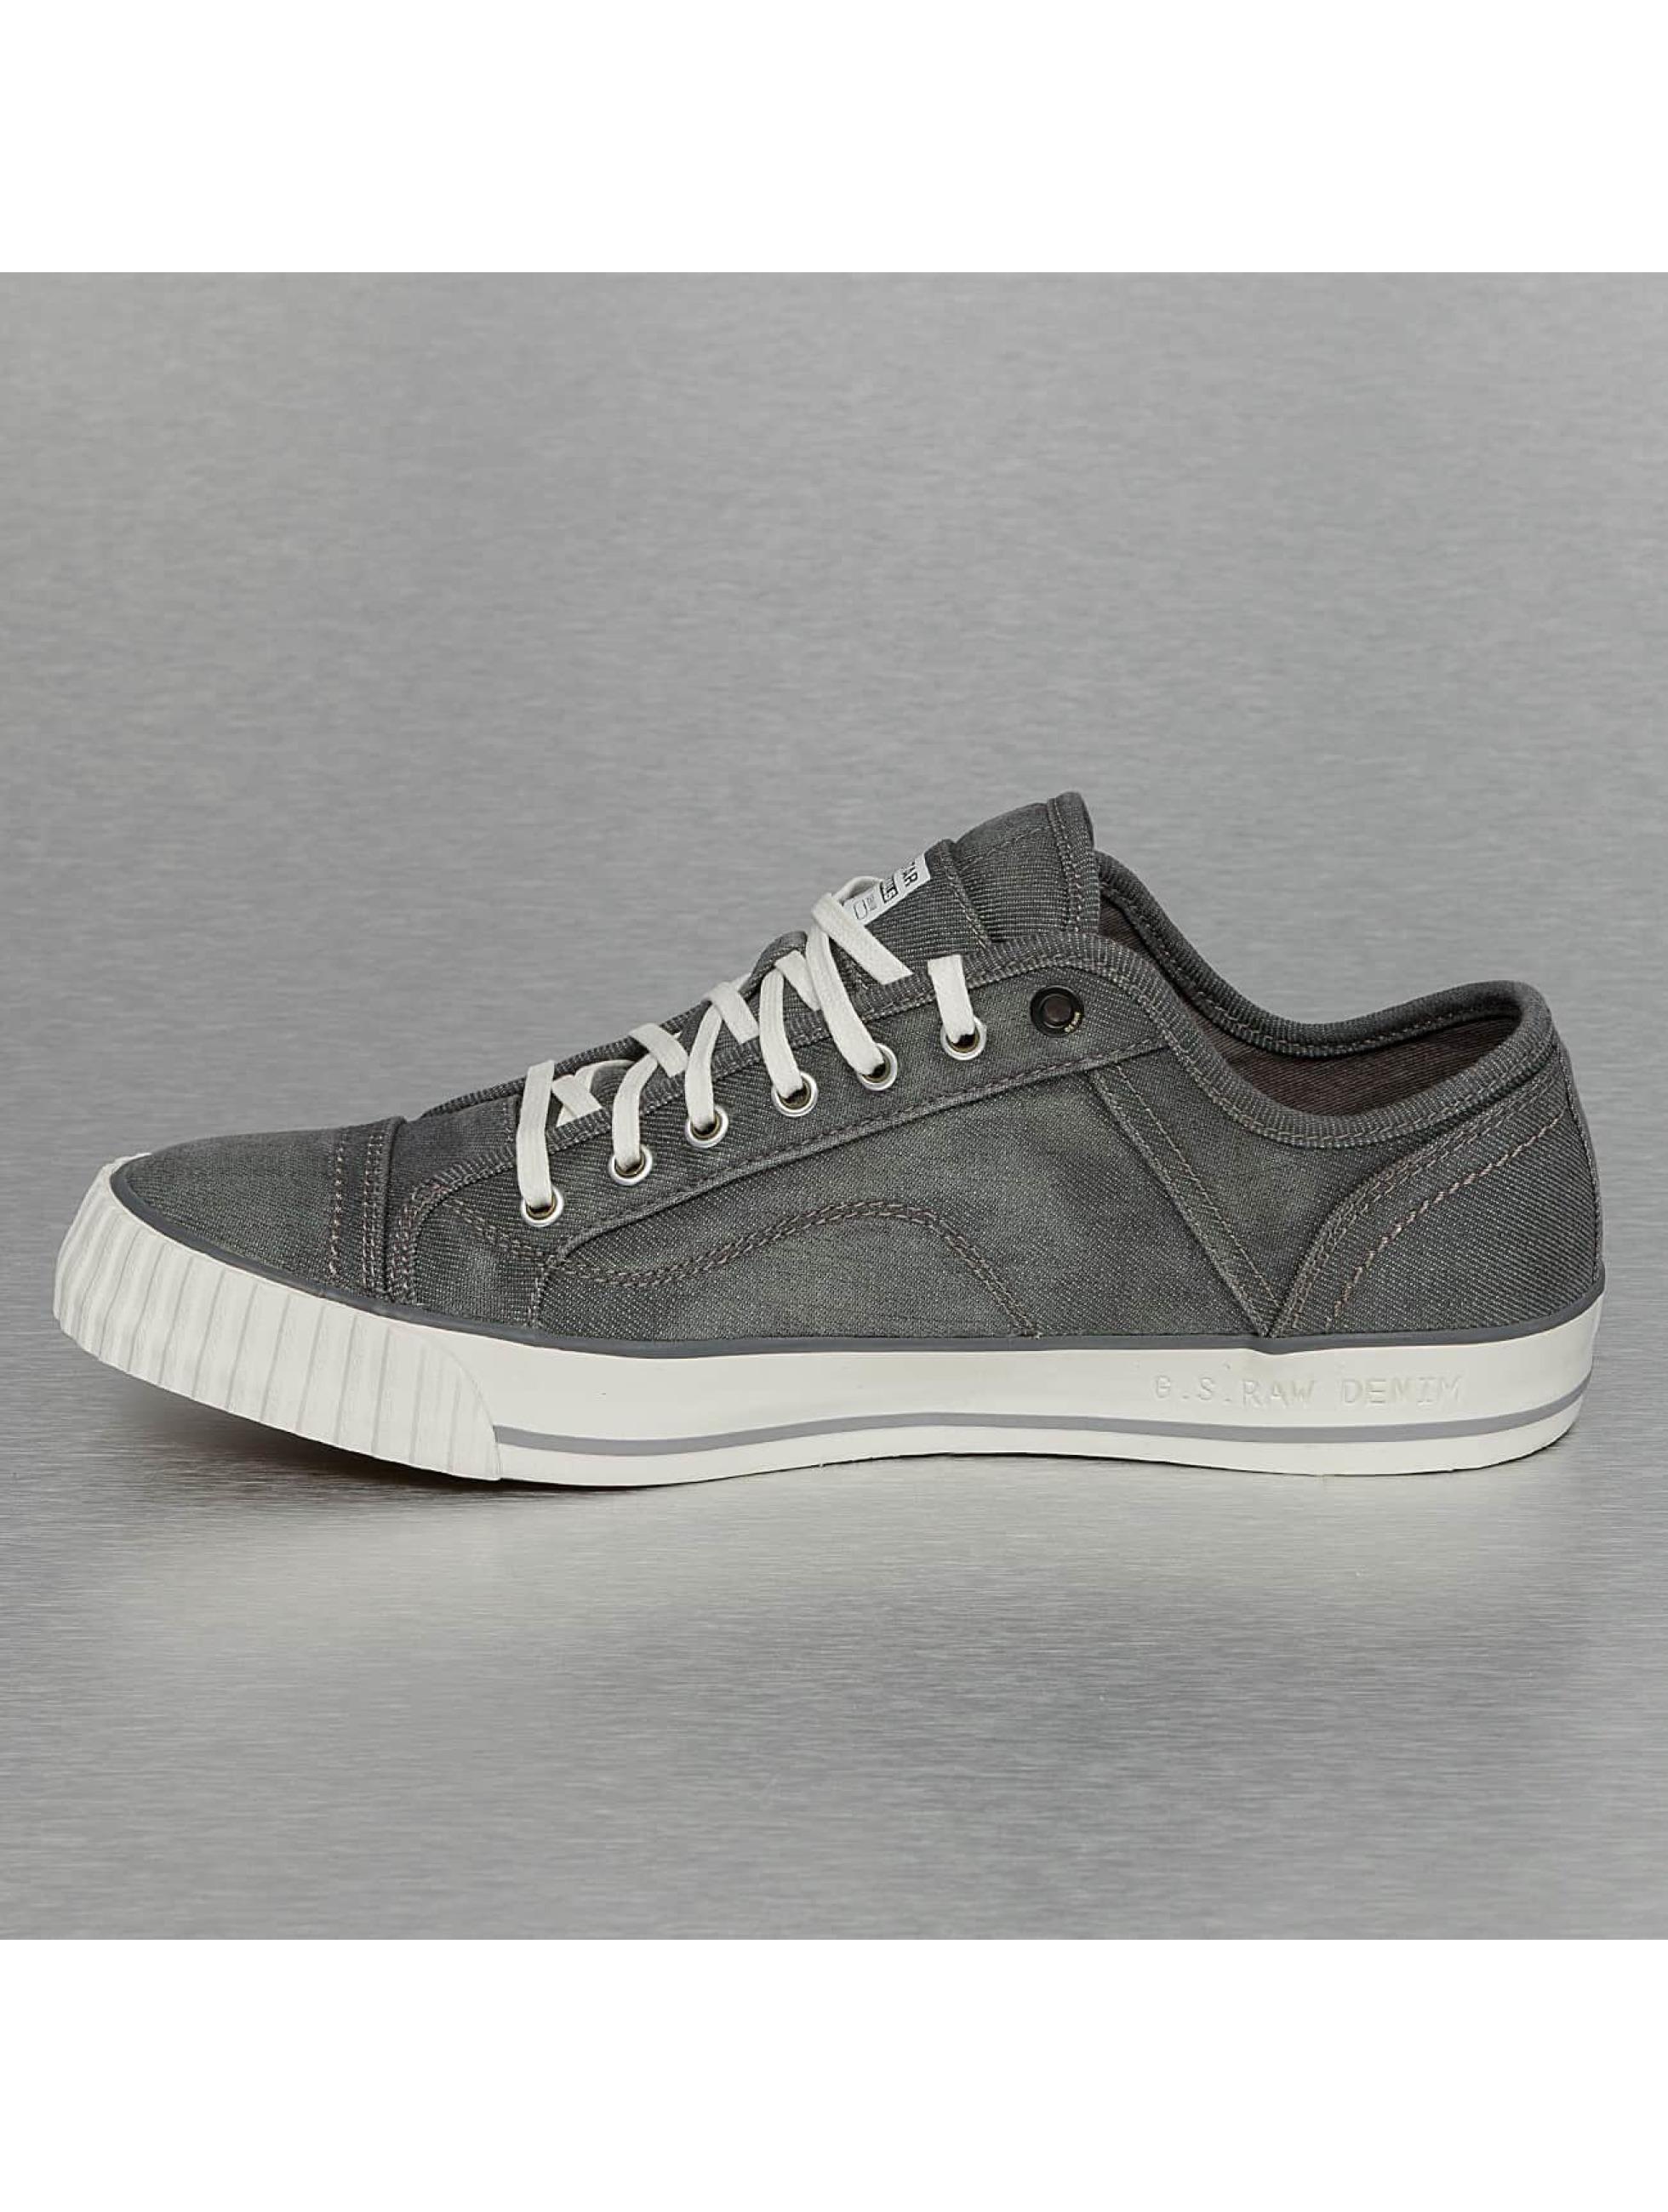 g star footwear herren schuhe sneaker falton ebay. Black Bedroom Furniture Sets. Home Design Ideas